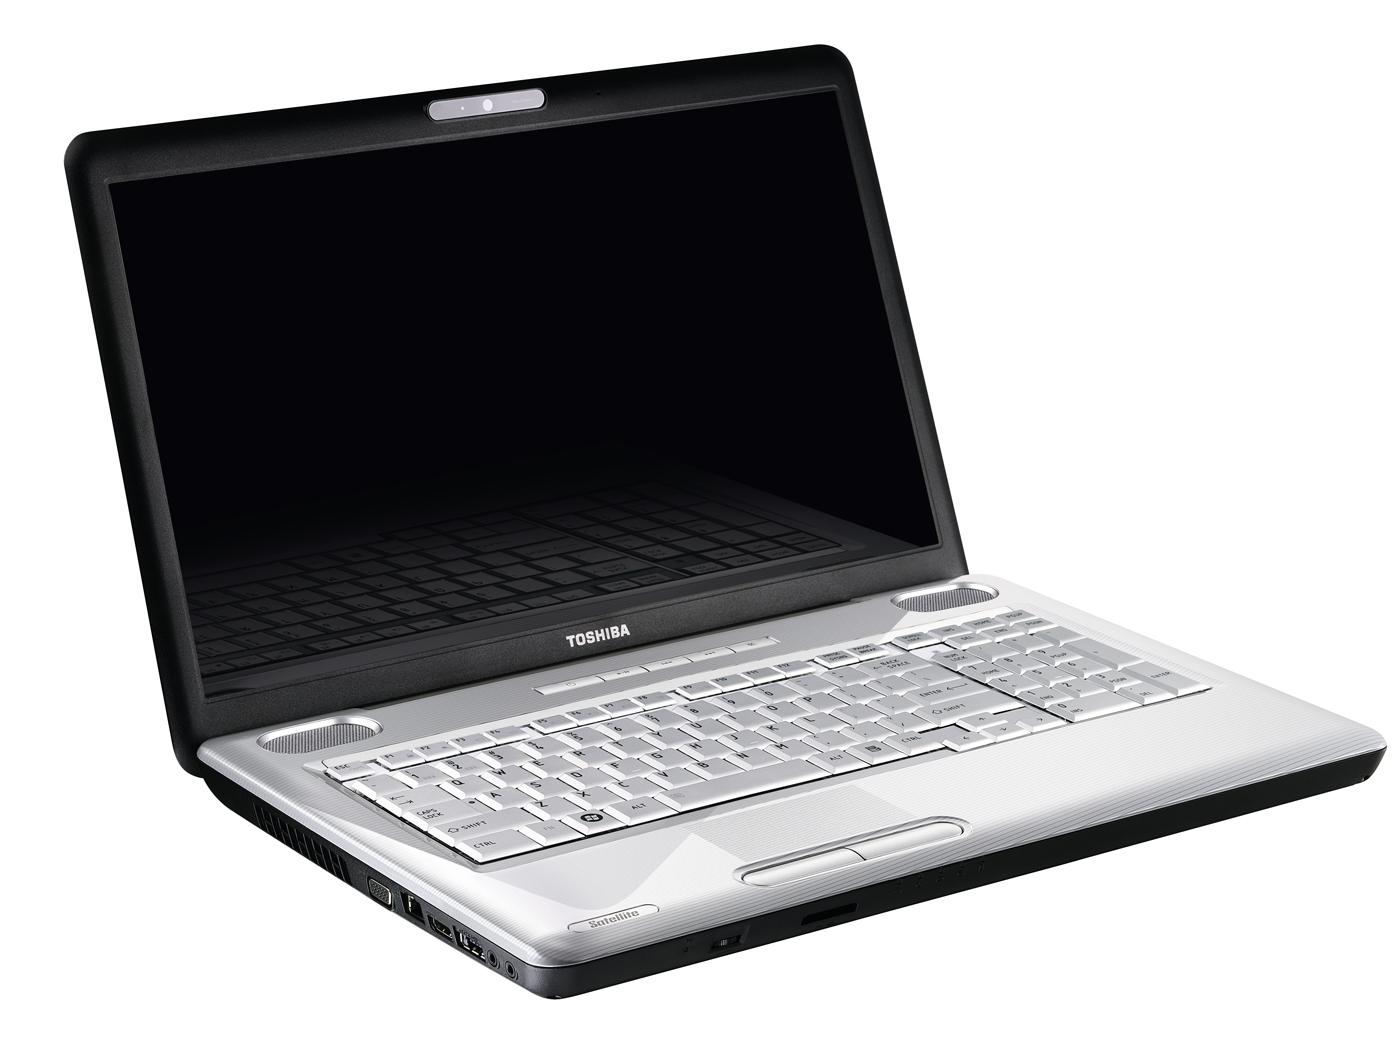 Toshiba Satellite L550 207 Notebookcheck Net External